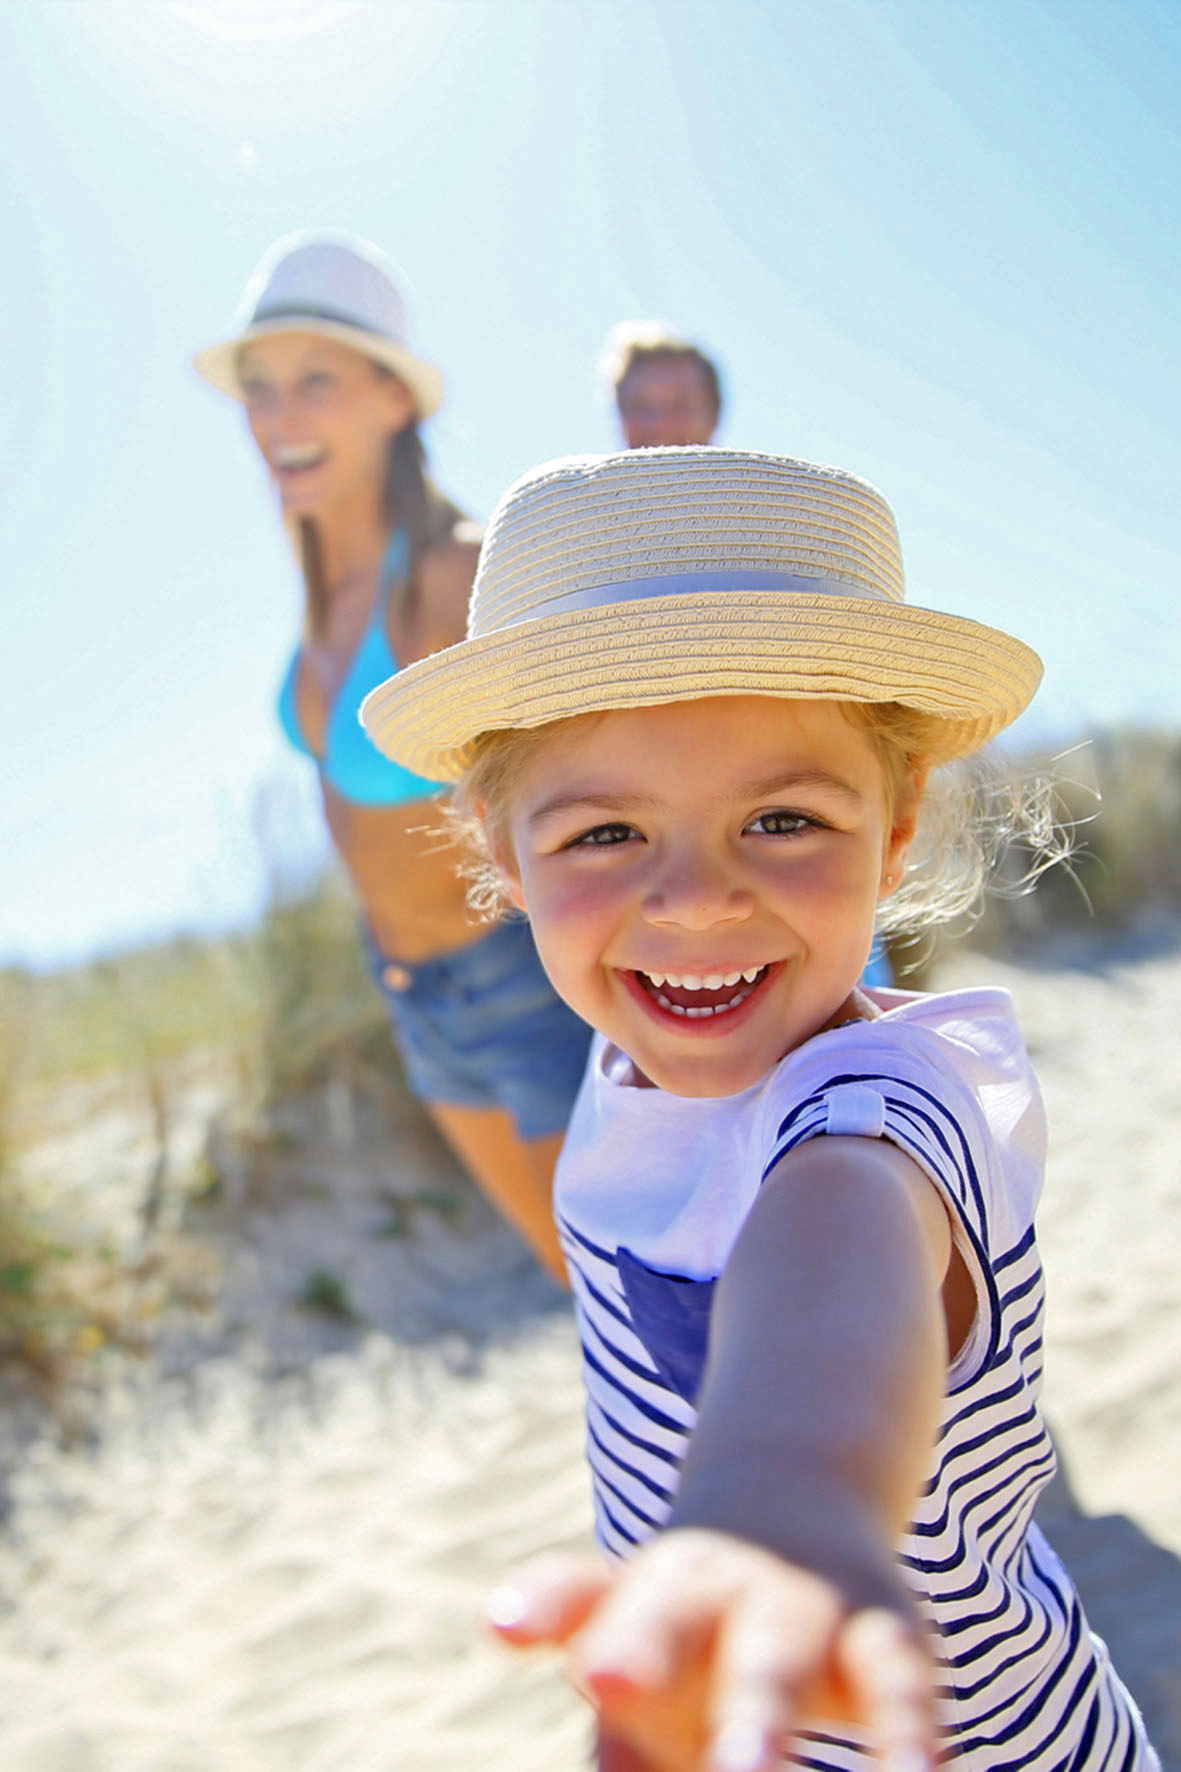 Familienspass am Strand - Das Kind hat Diabetes